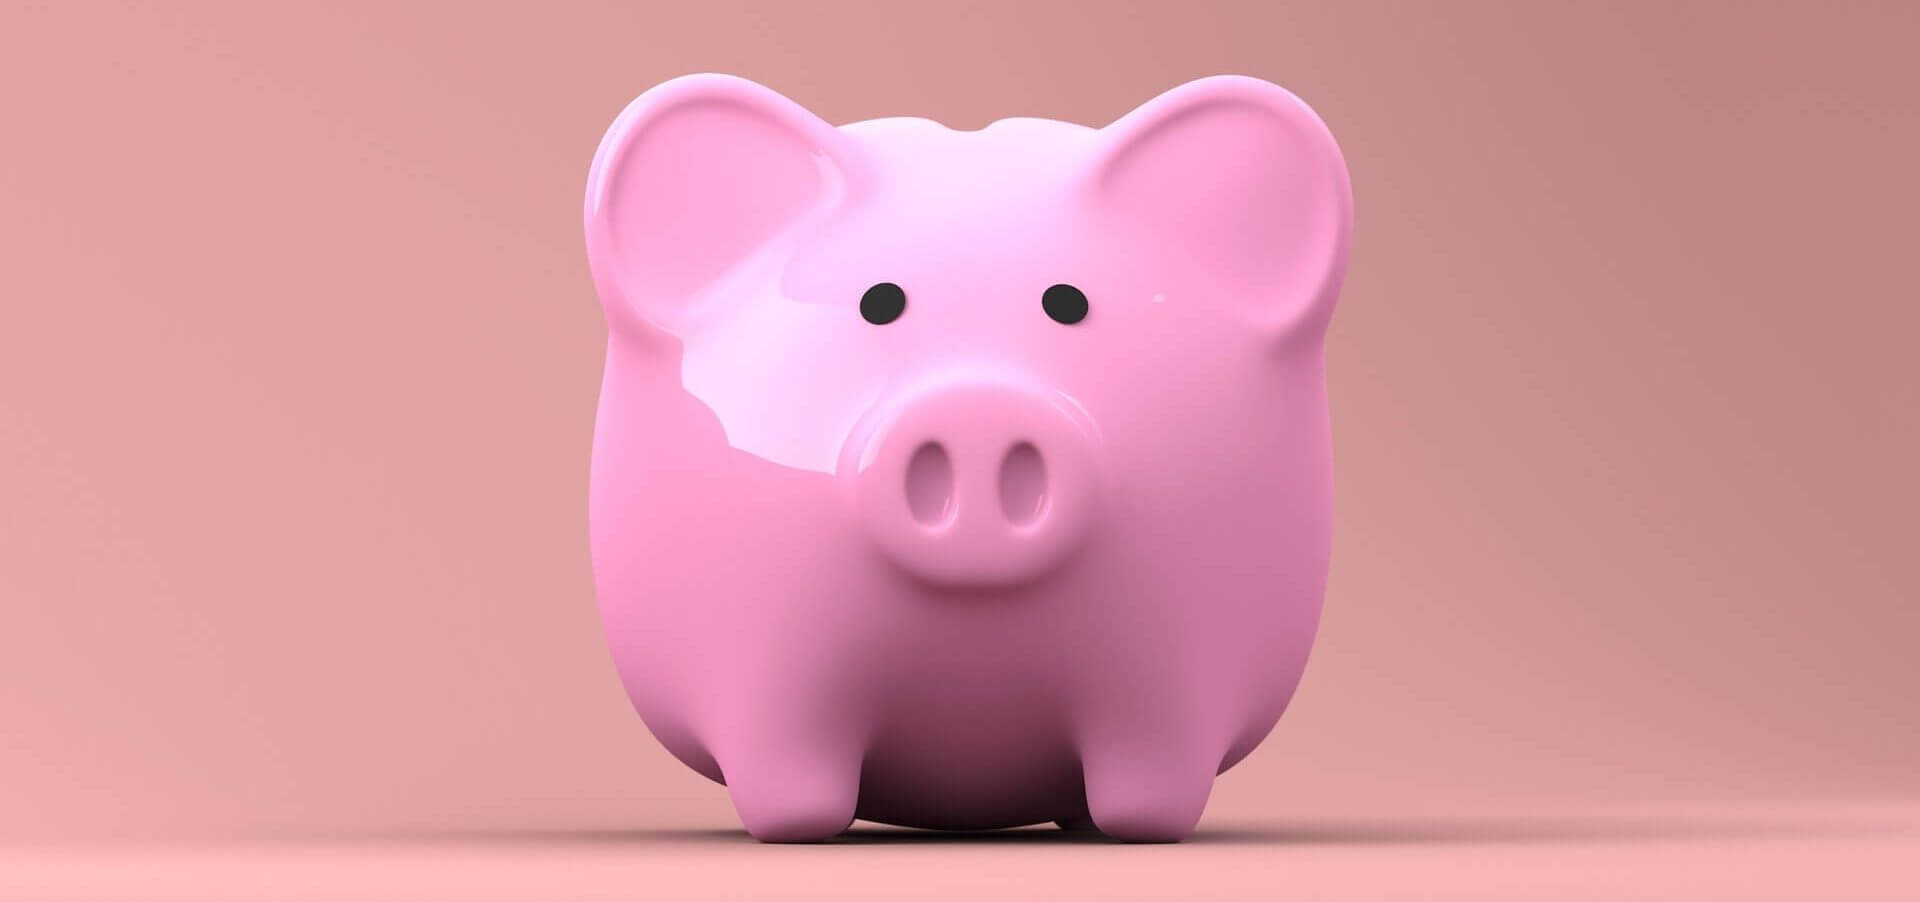 A pink piggy bank on a pink background.